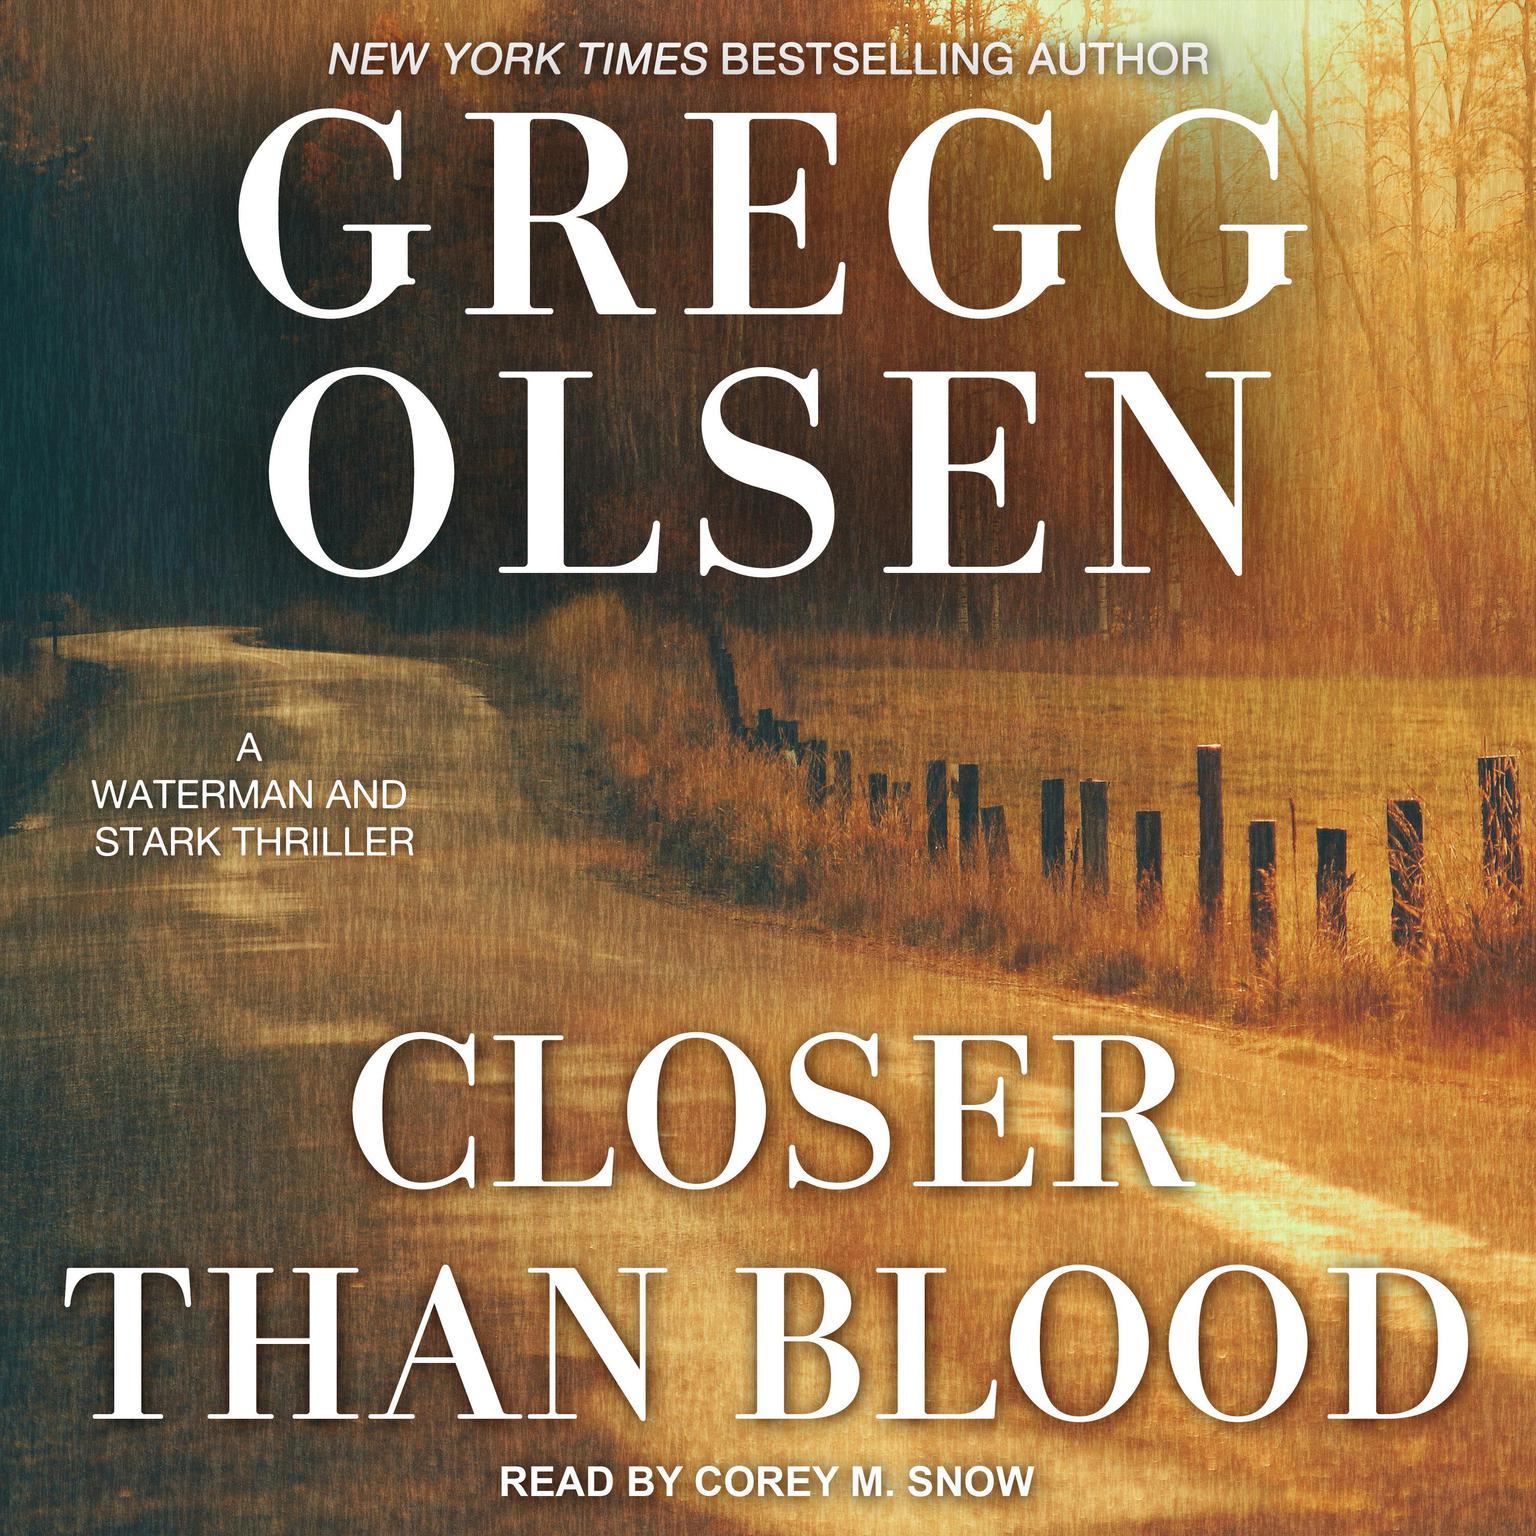 Closer Than Blood Audiobook, by Gregg Olsen